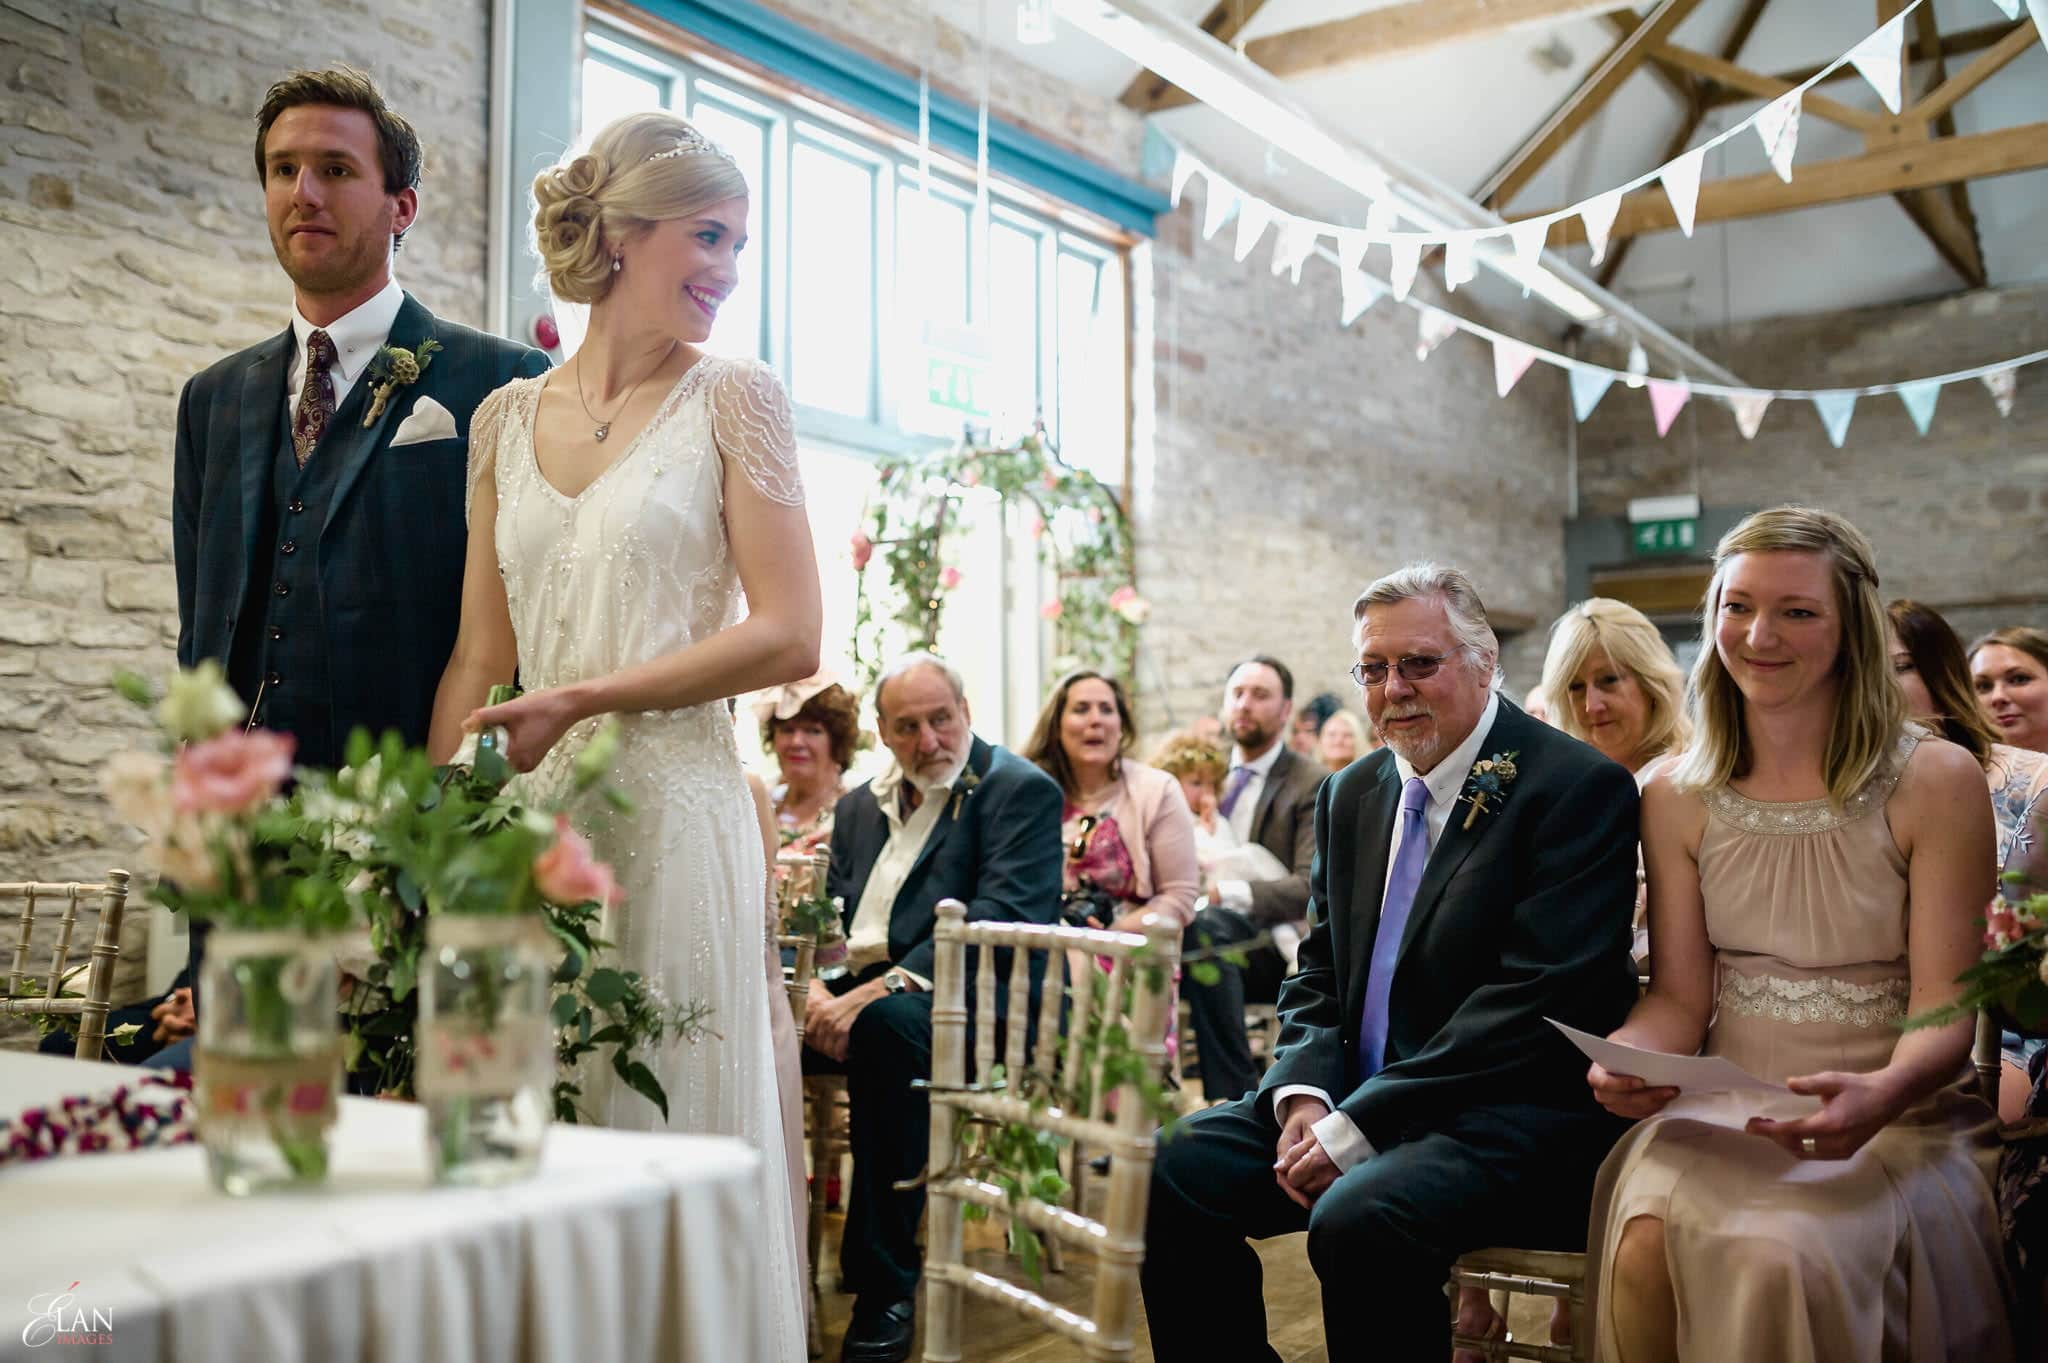 Spring Wedding at the Folly Farm Centre, Bristol 16